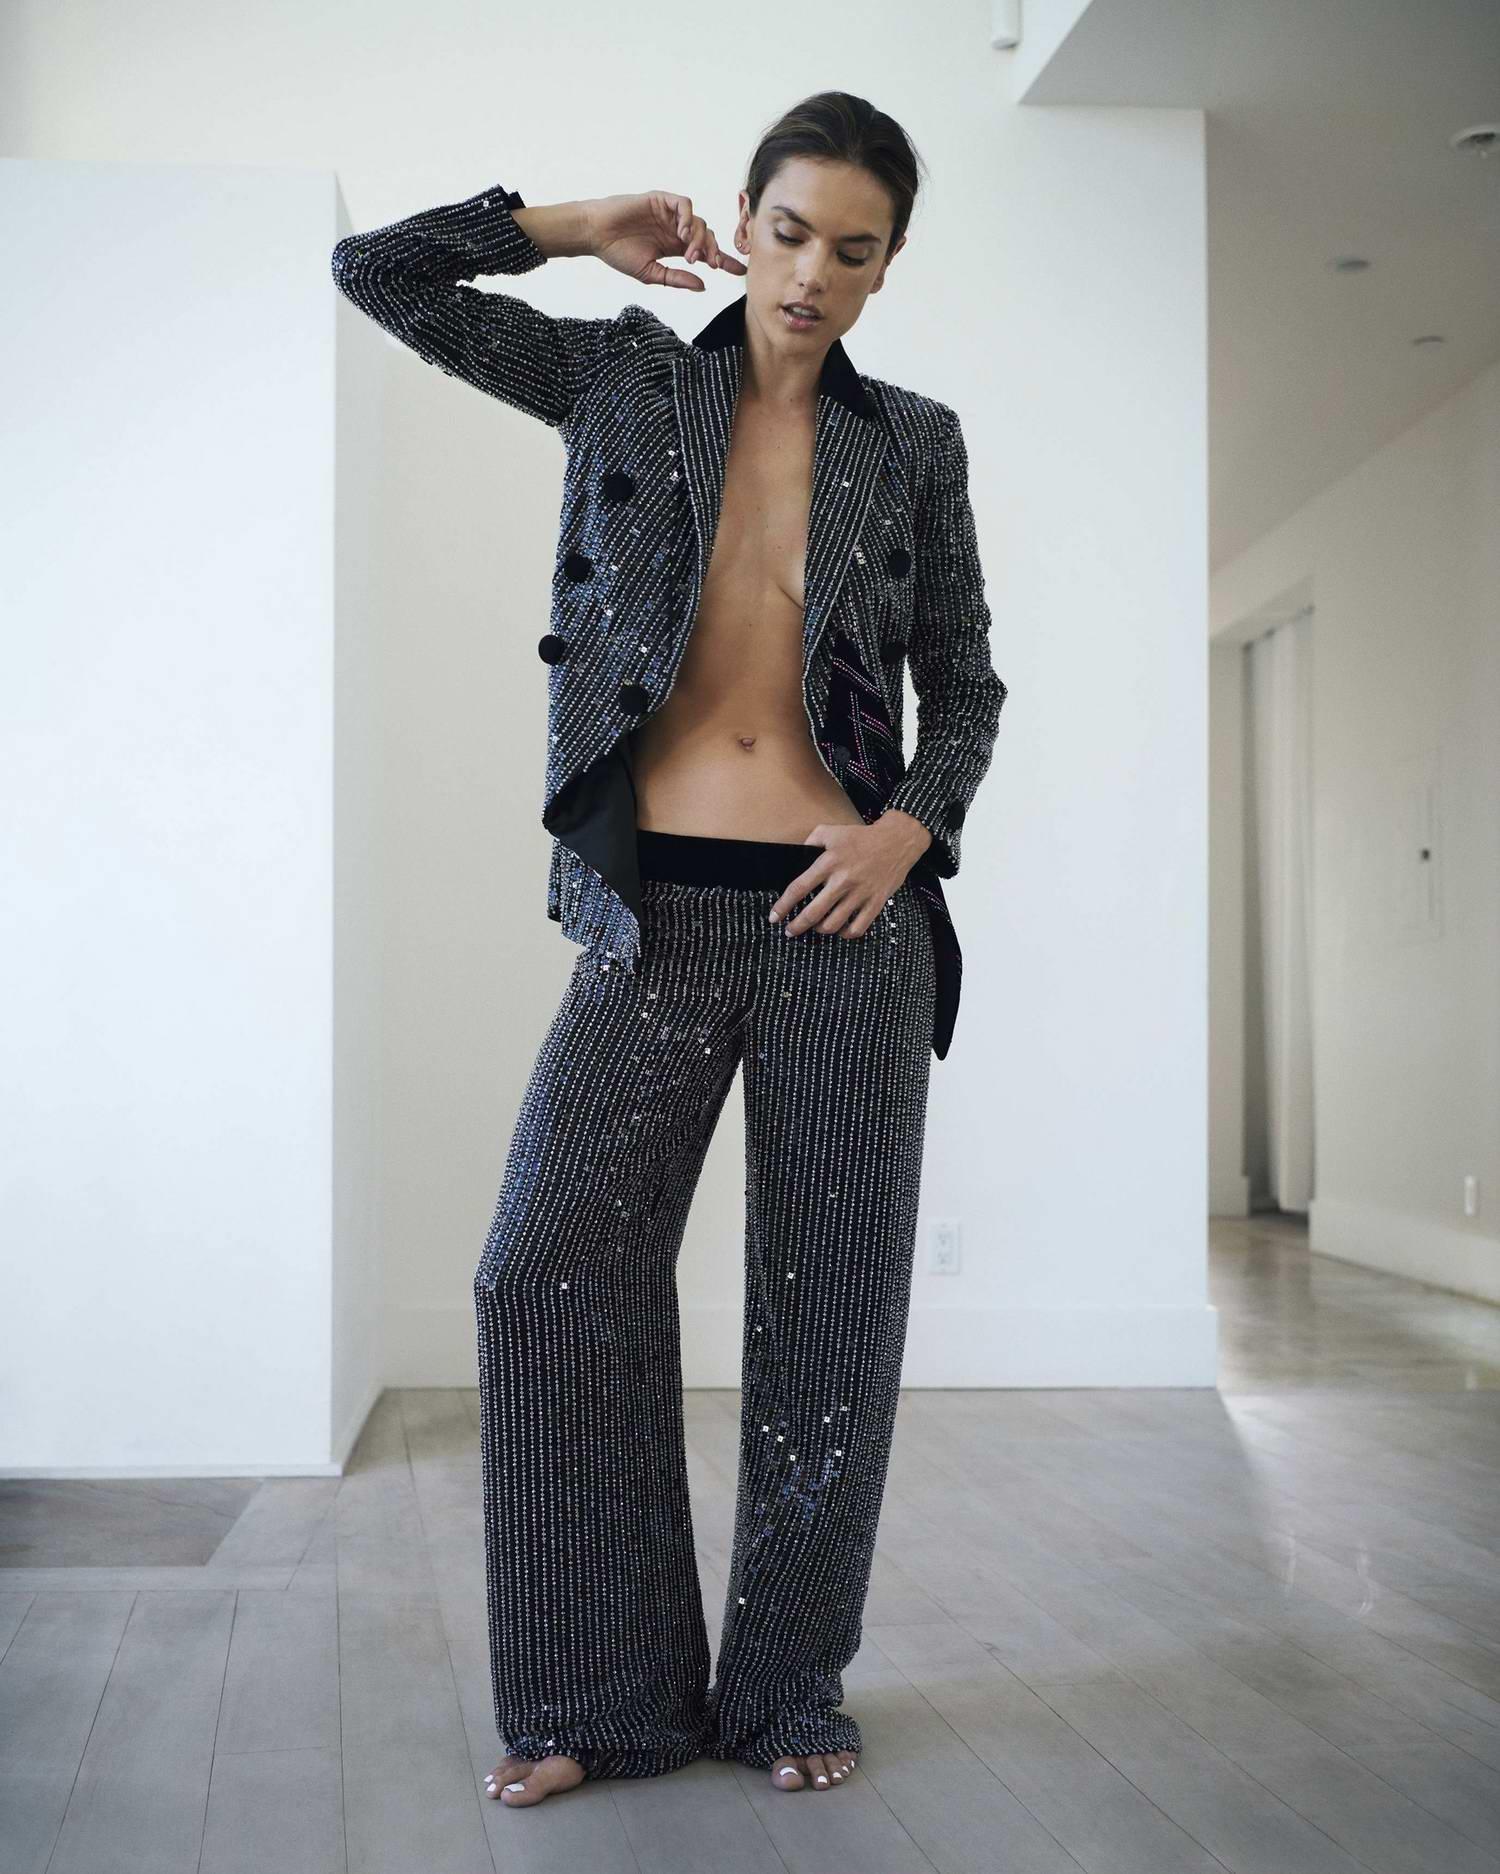 Alessandra Ambrosio features in Fashion & Arts Magazine - October 2018